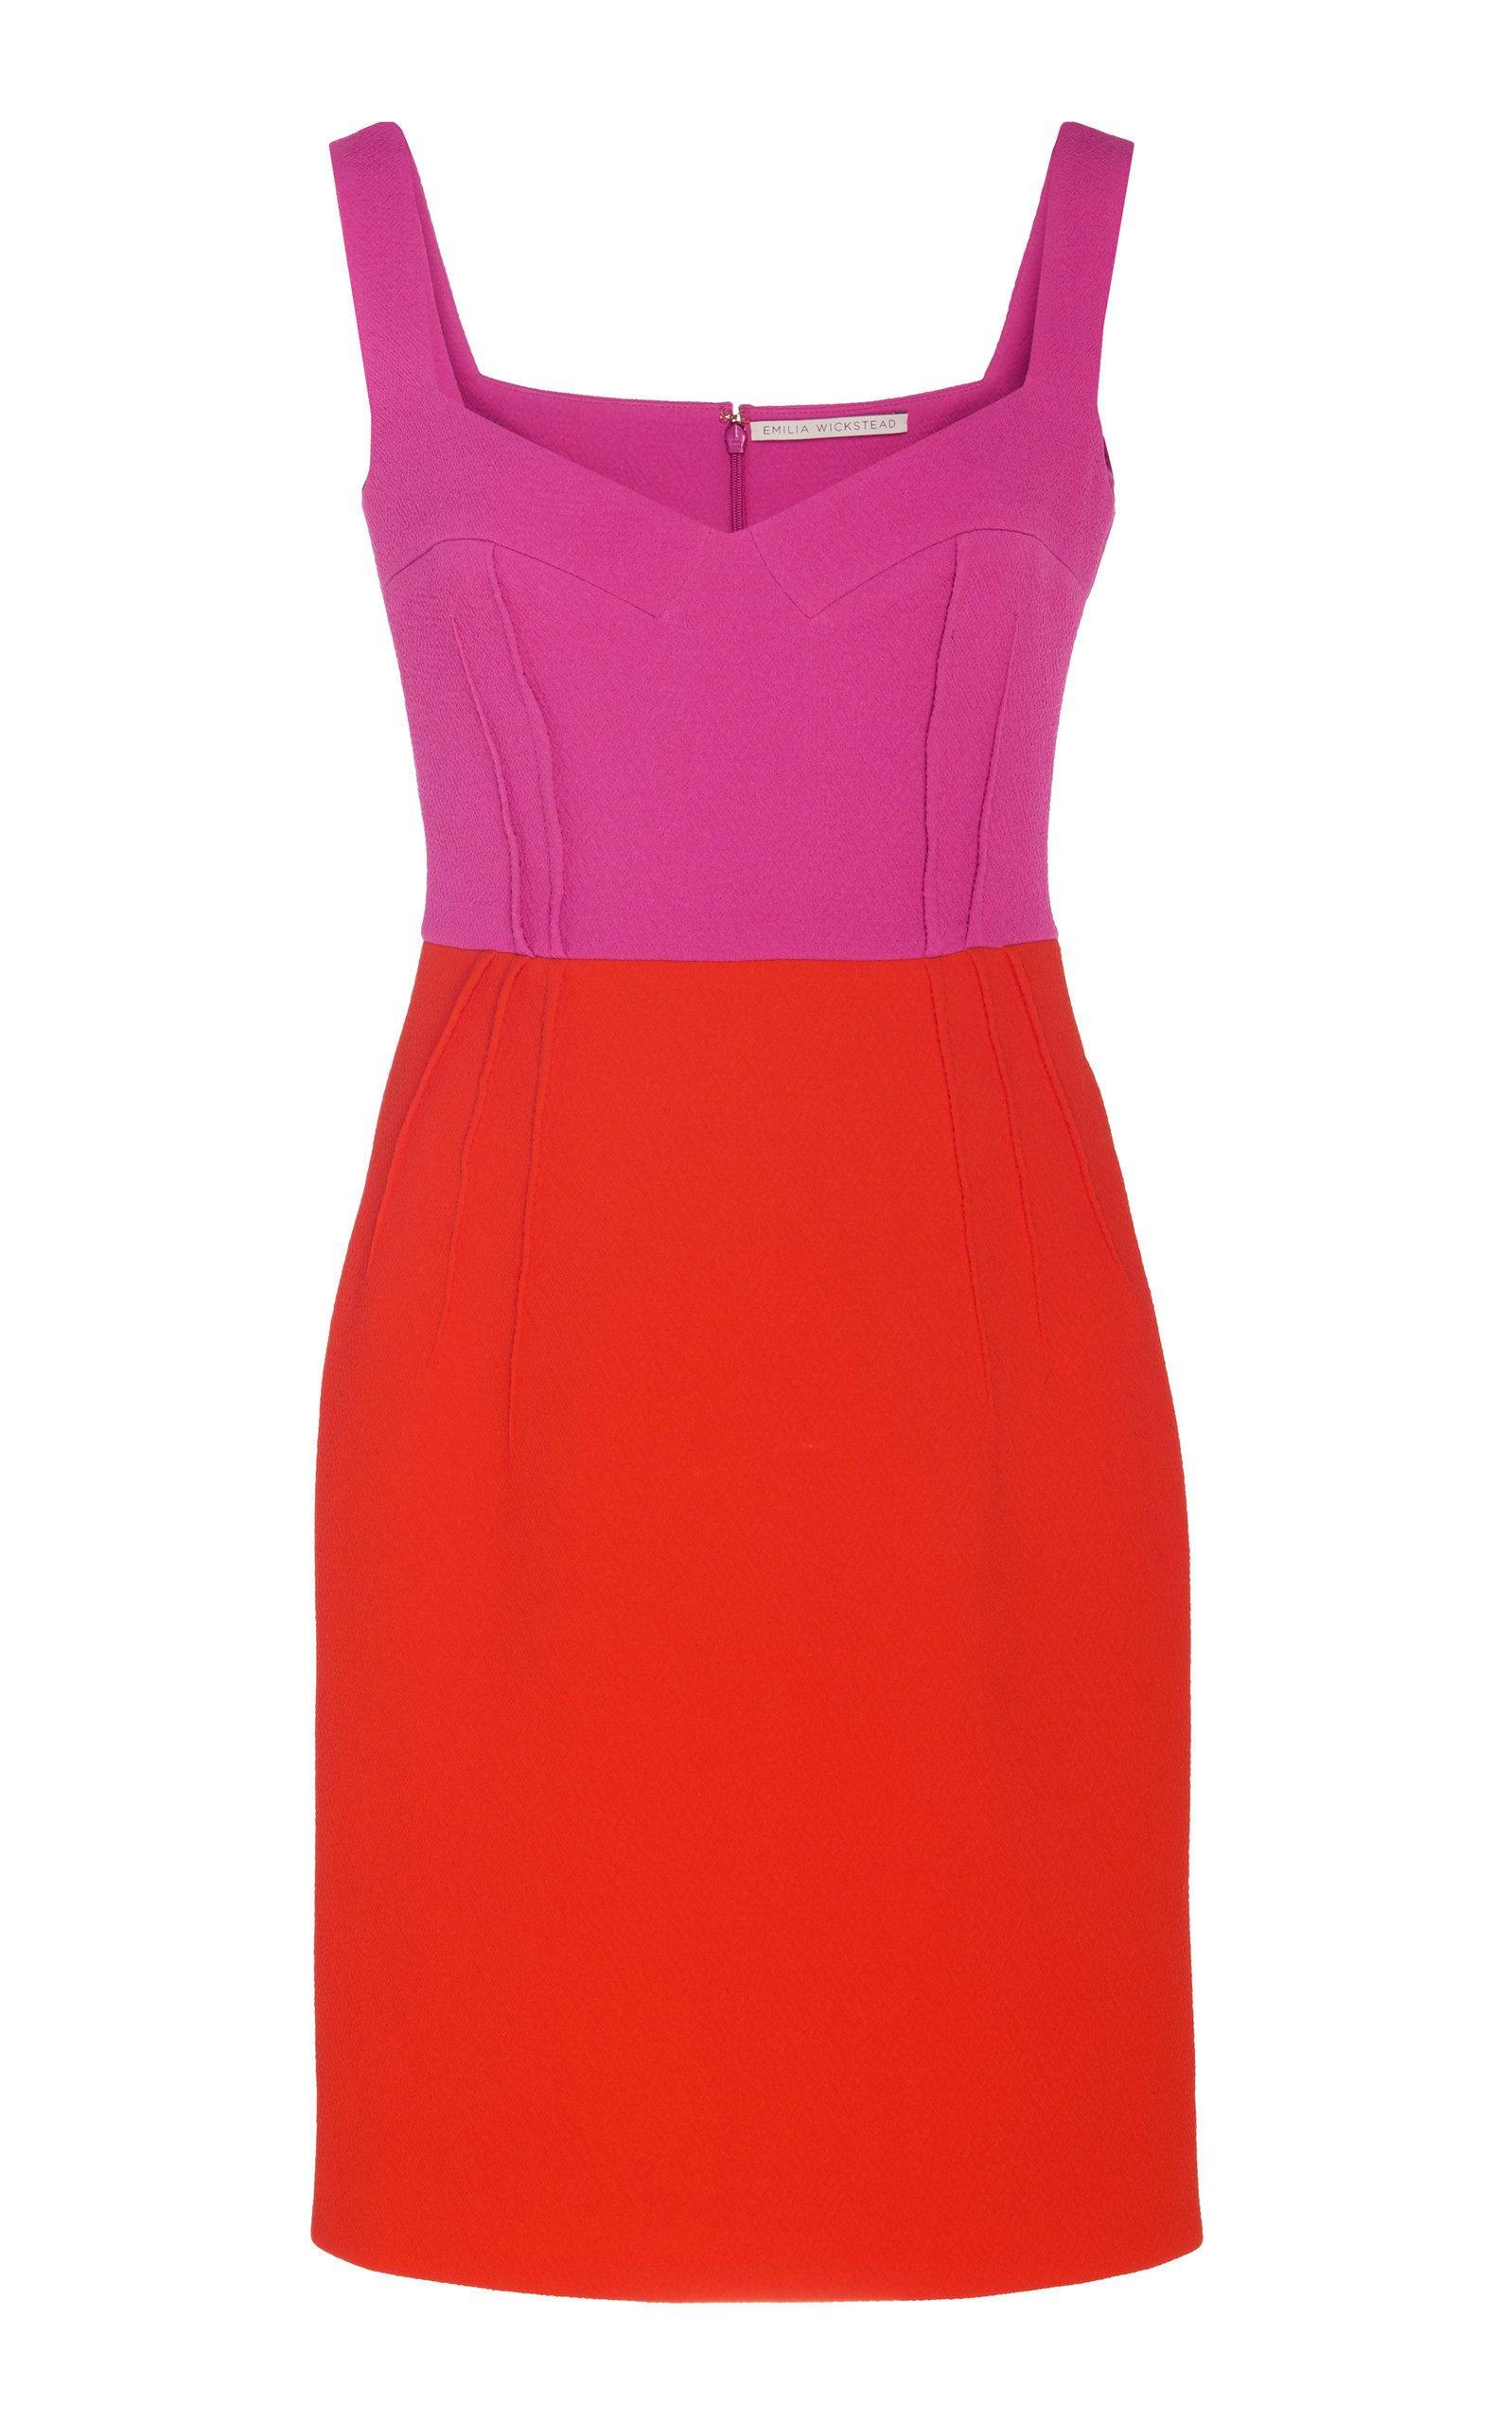 Emilia Wickstead Jude Two-Tone Cadi Mini Dress